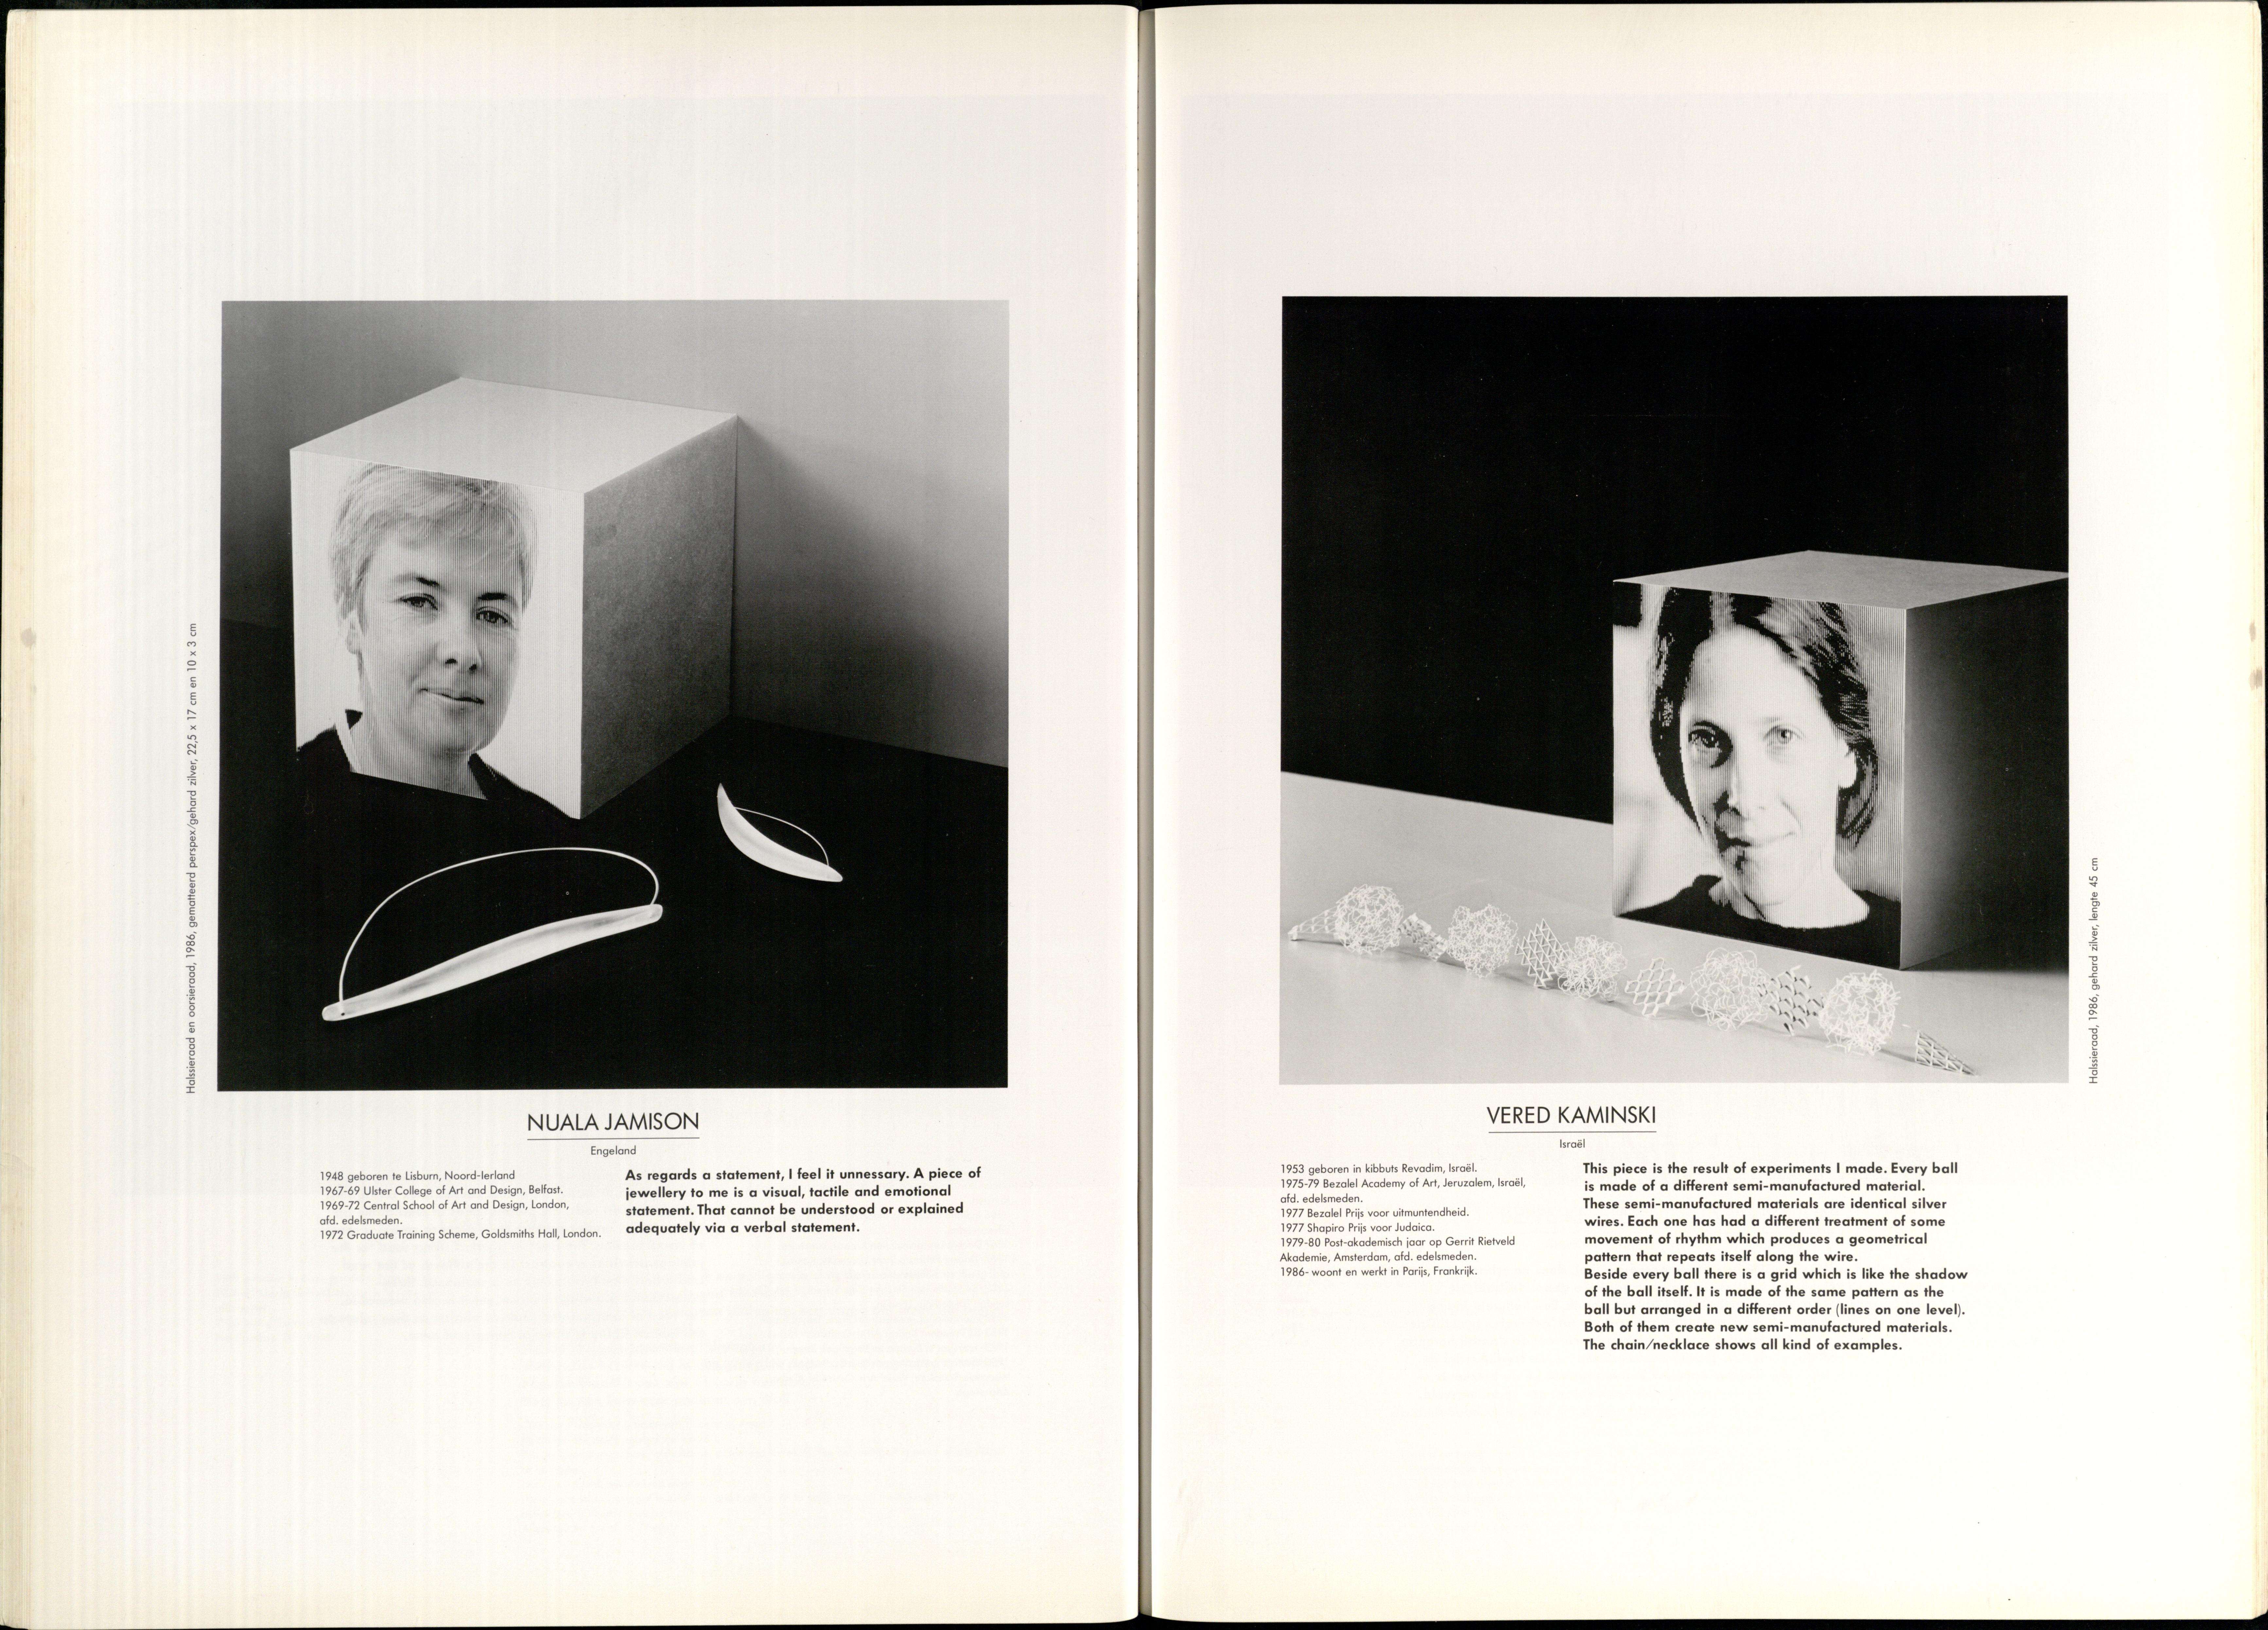 10 Jaar Ra, bladzijde 42 en 43, Nuala Jamison en Vered Kaminski, 1986, foto's Anna Beeke, portret, halssieraden, oorsieraad, drukwerk, papier, zilver, perspex